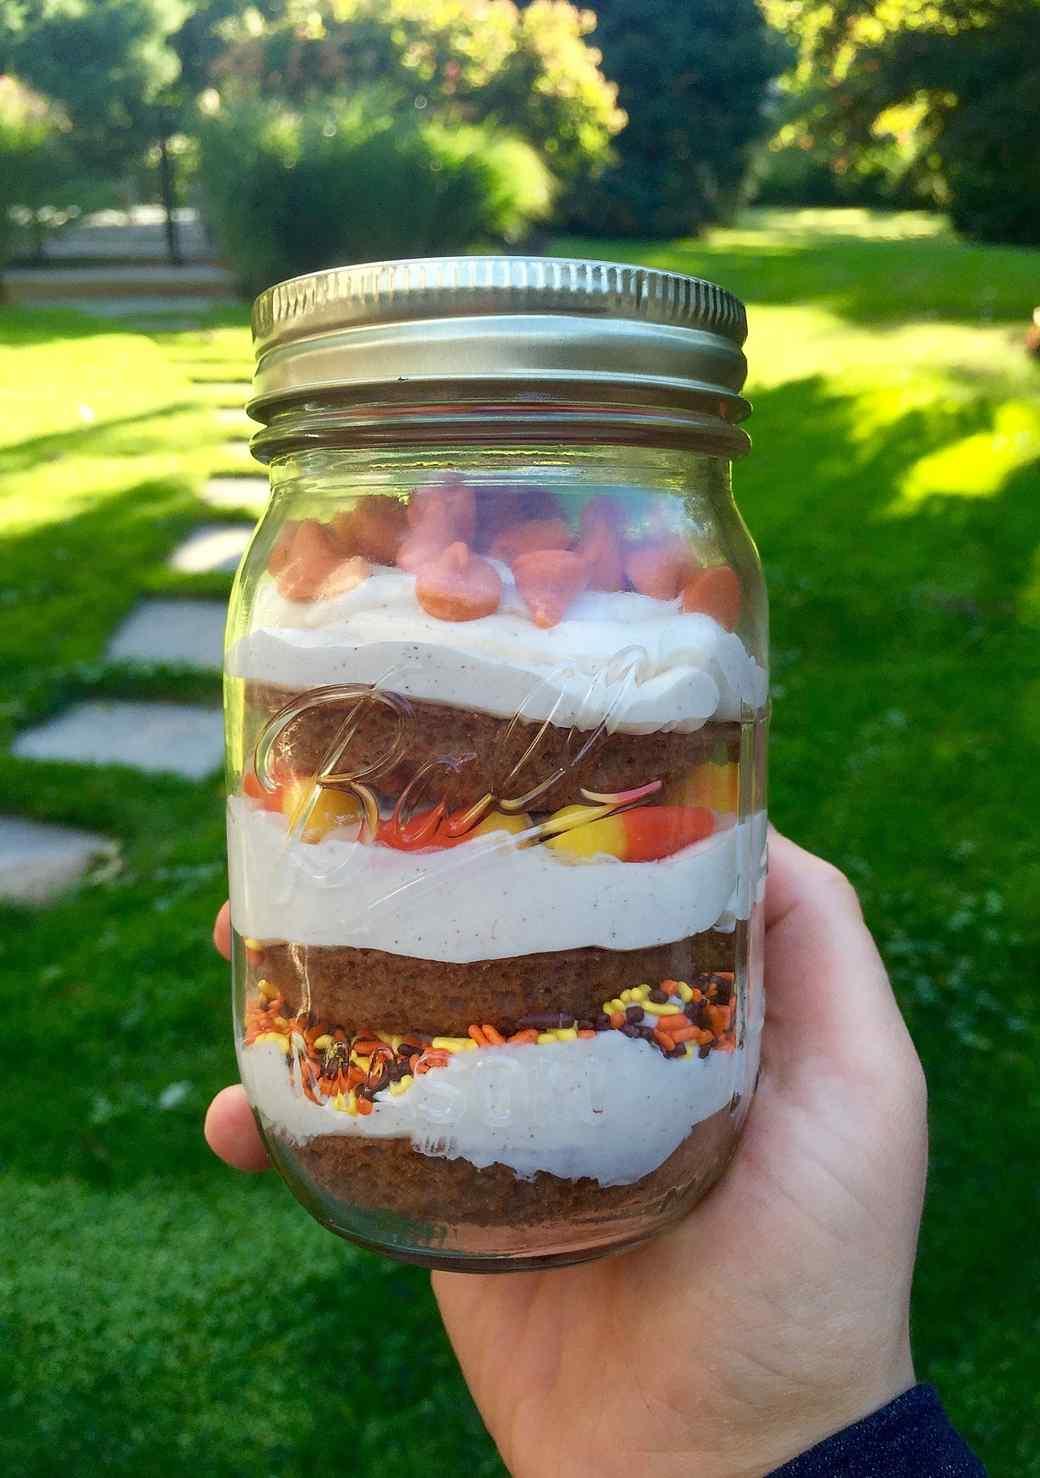 Pumpkin Spice Cupcakes in a Jar